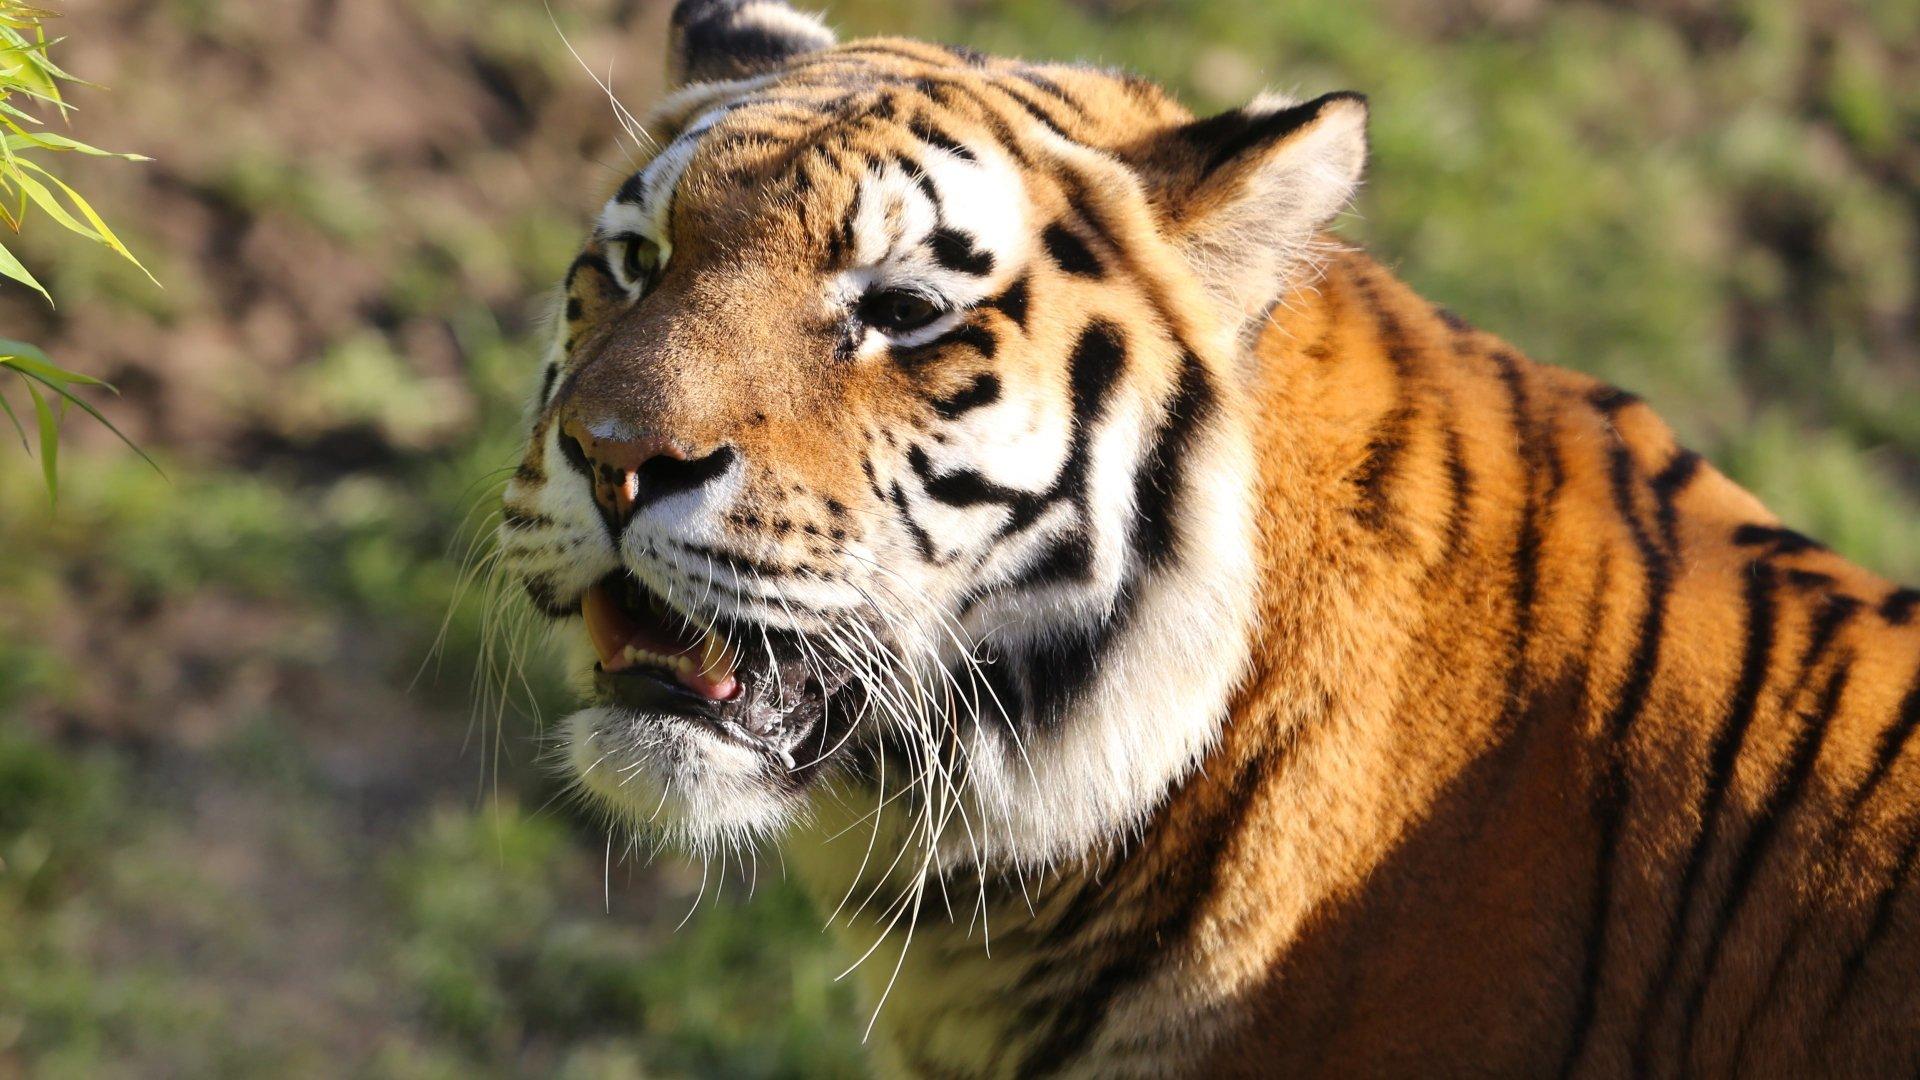 Tiger 4k Ultra HD Wallpaper | Background Image | 3840x2160 ...